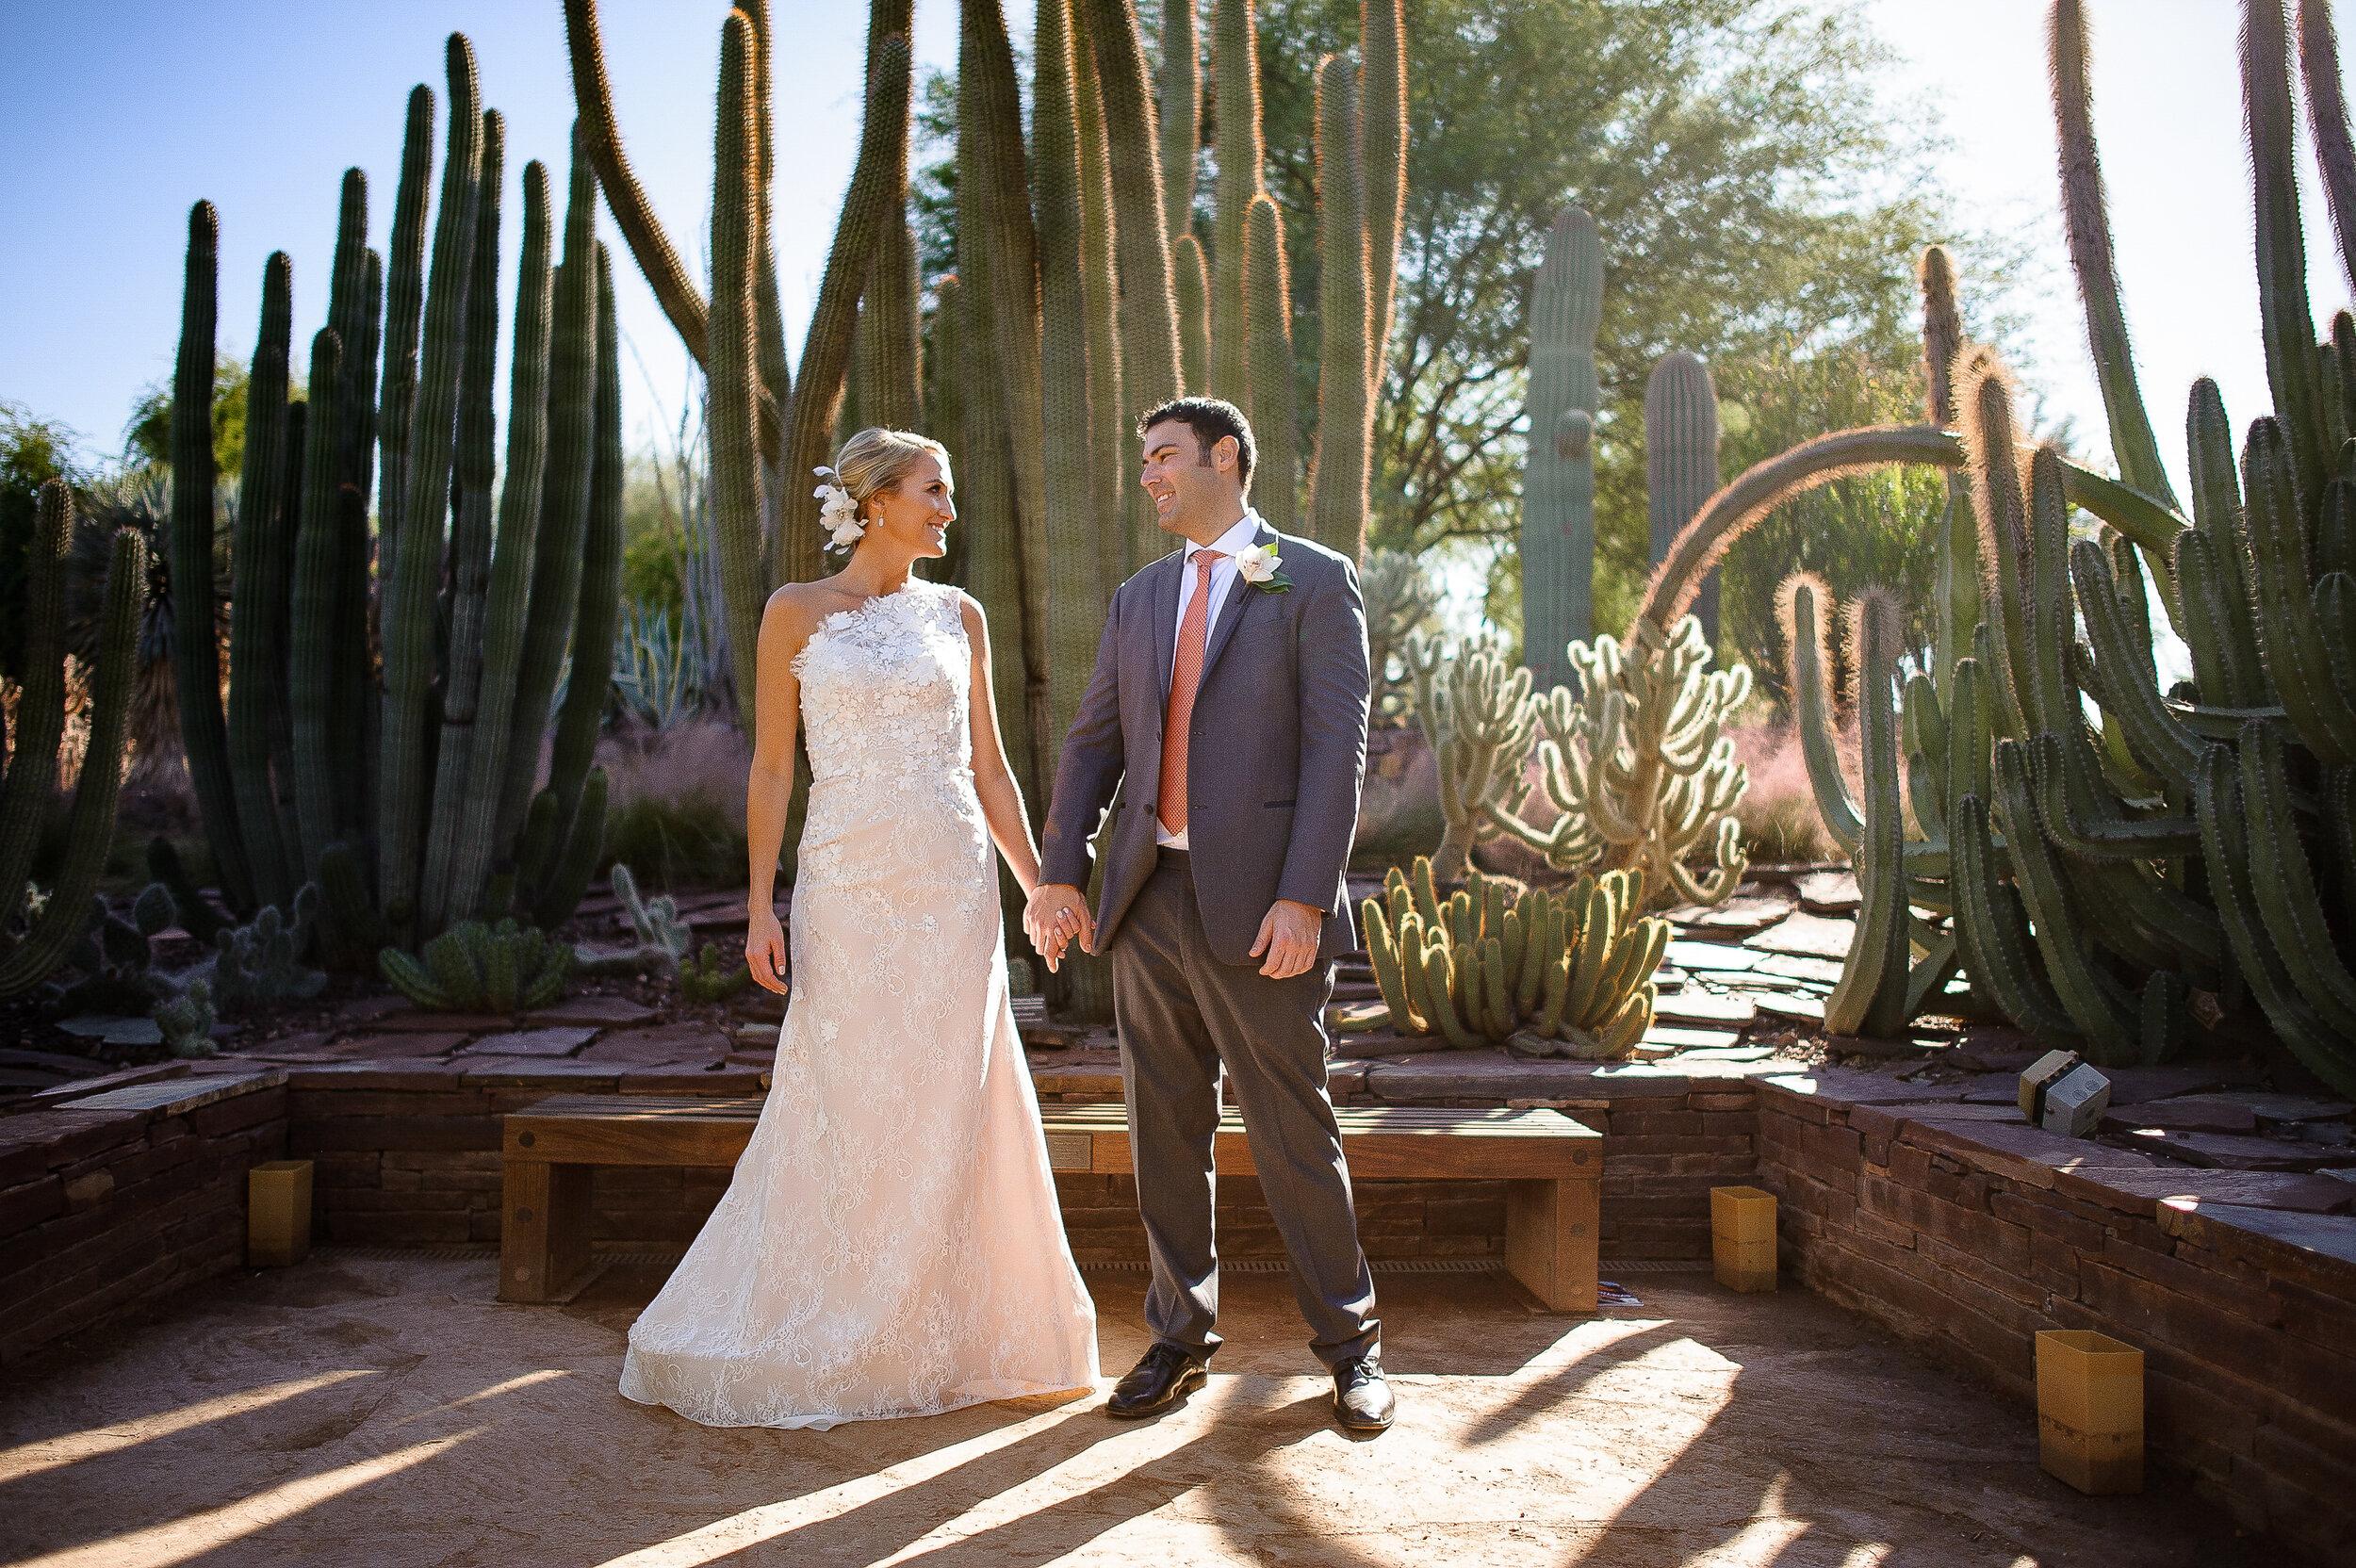 Winter Phoenix resort wedding46.jpg